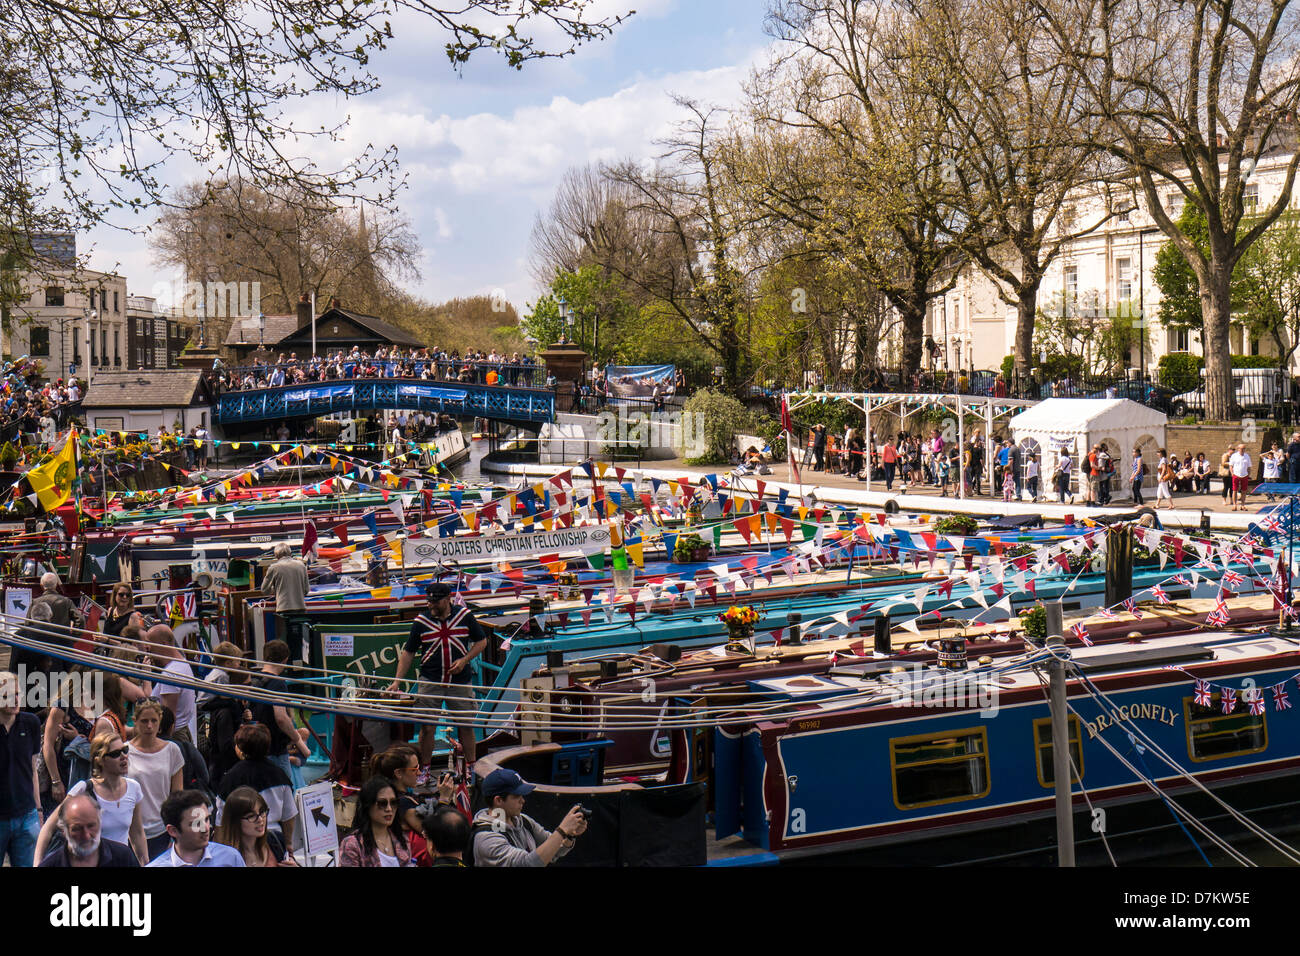 narrowboat-cavalcade-gathering-at-little